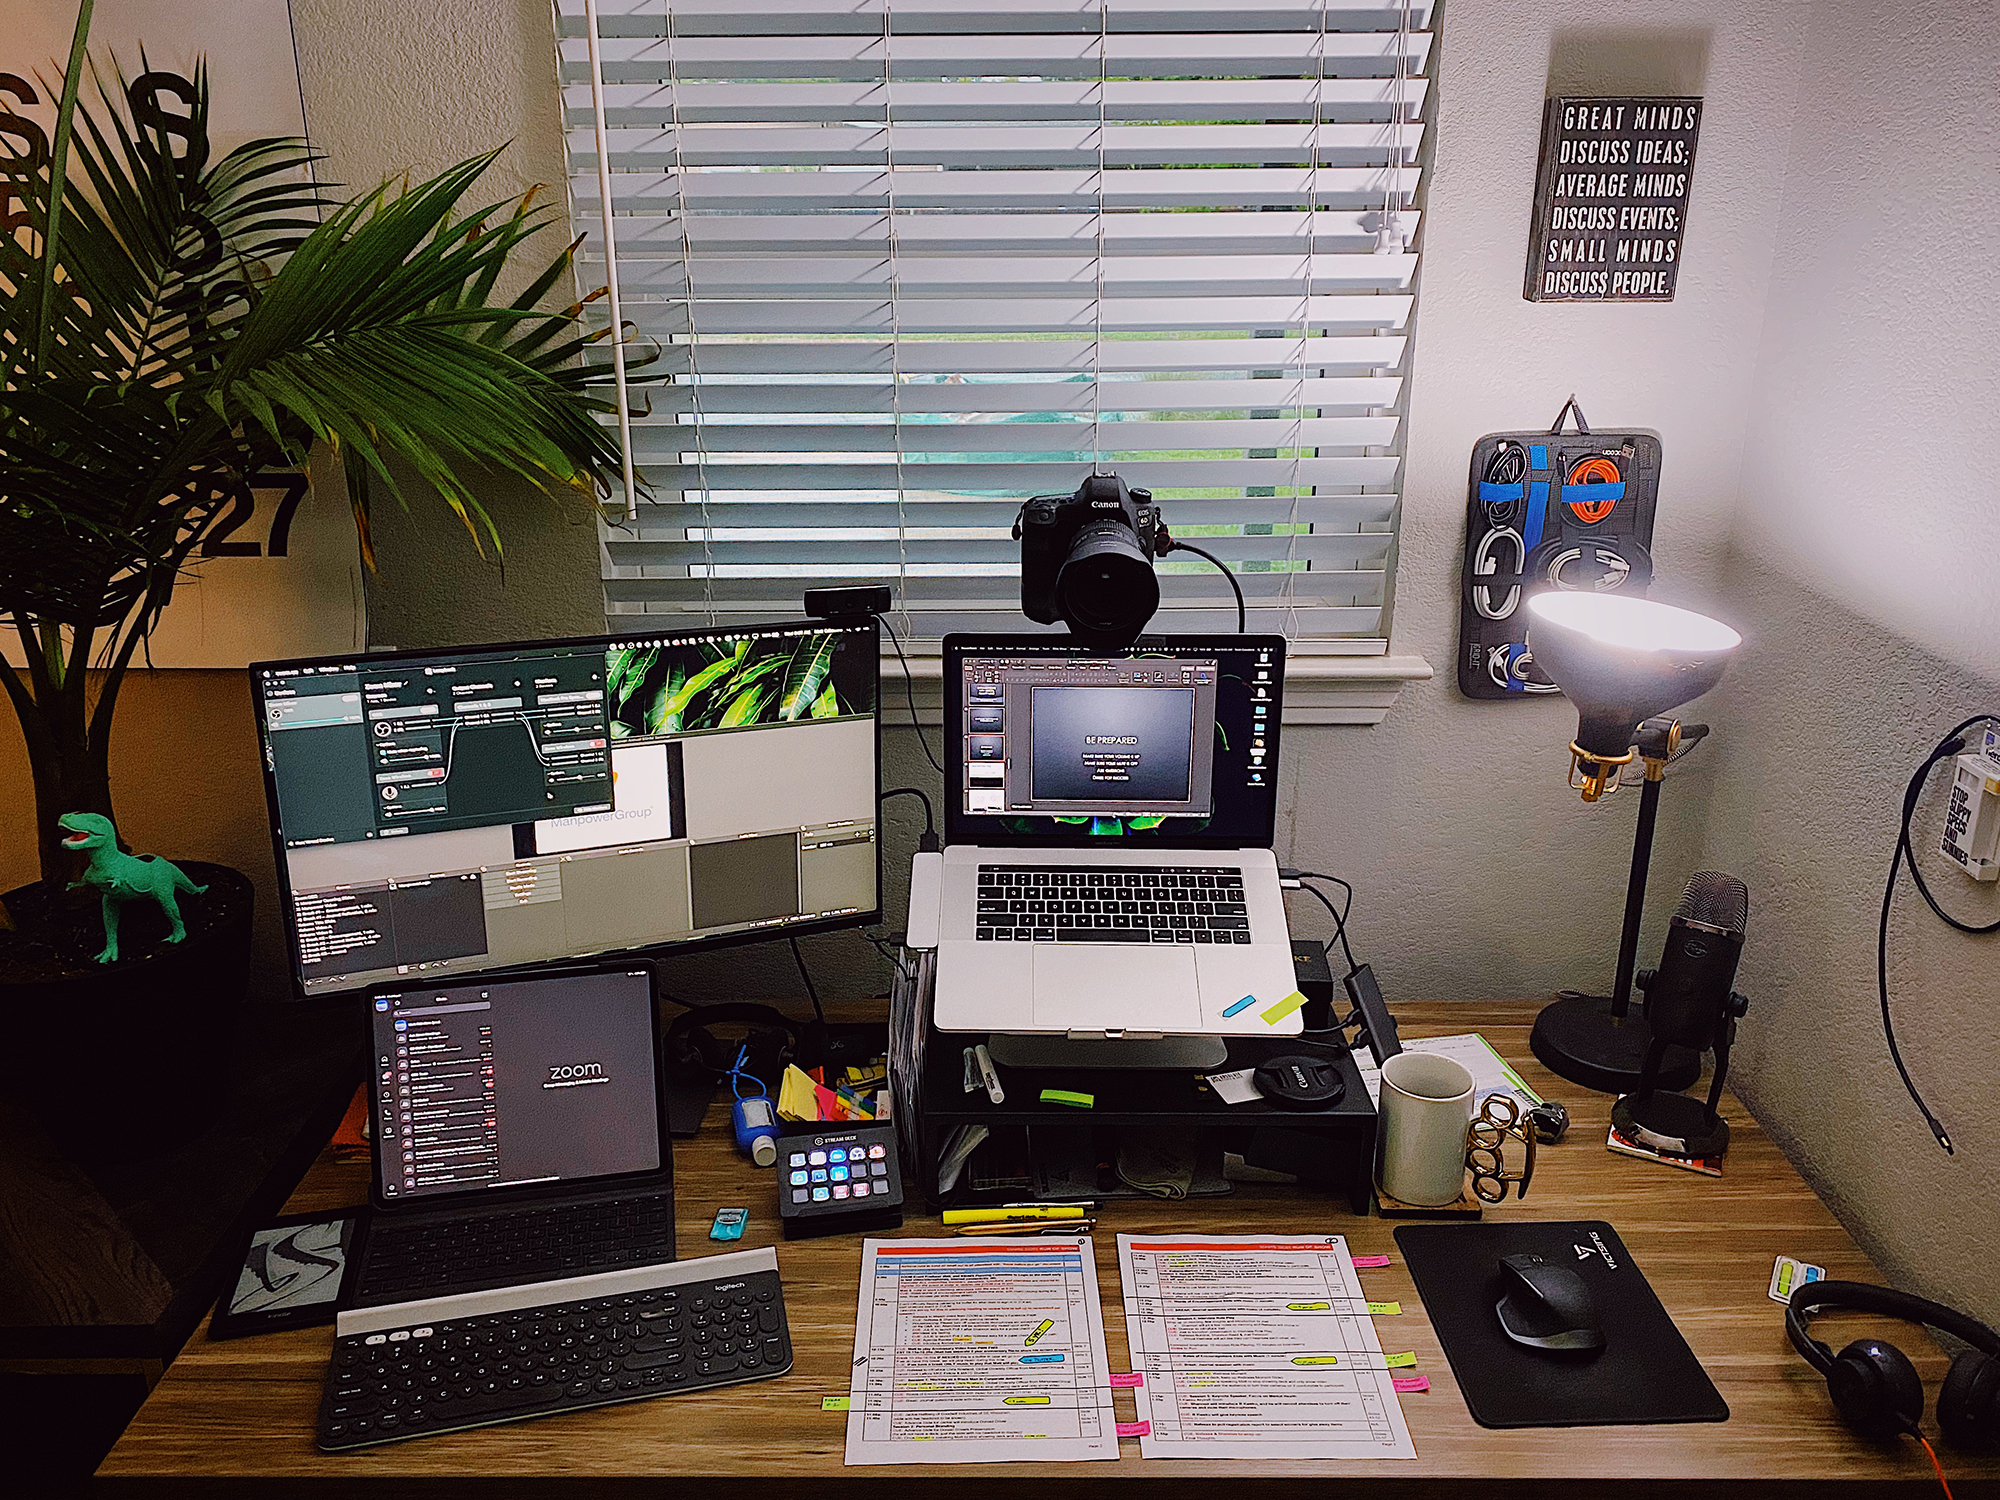 "30"" x 60"" Stromboli Laminate Top with Black VertDesk Stand Up Desk Frame"